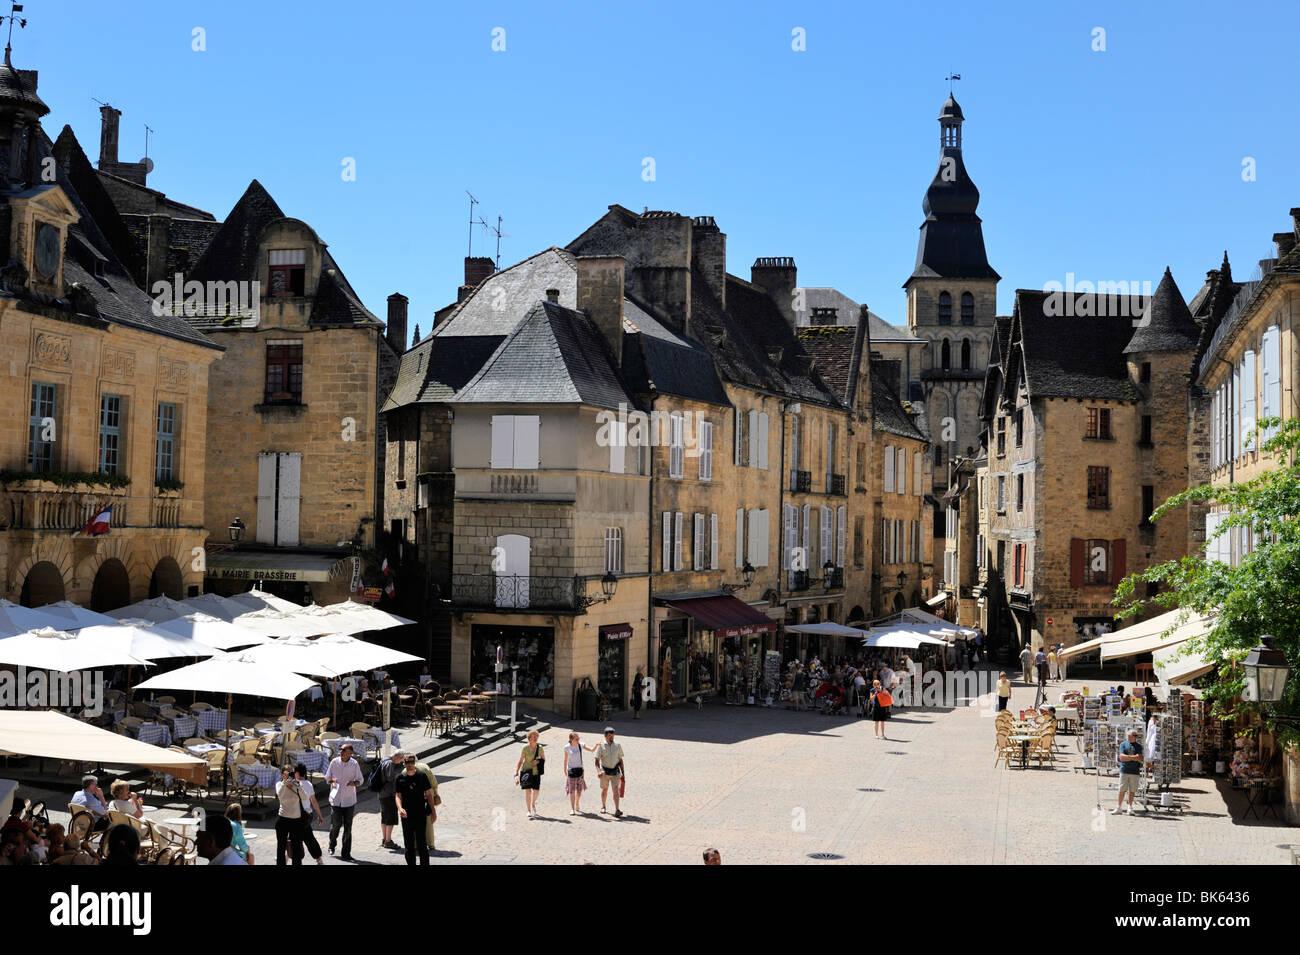 Place de la Liberte in the old town, Sarlat, Dordogne, France, Europe Stock Photo